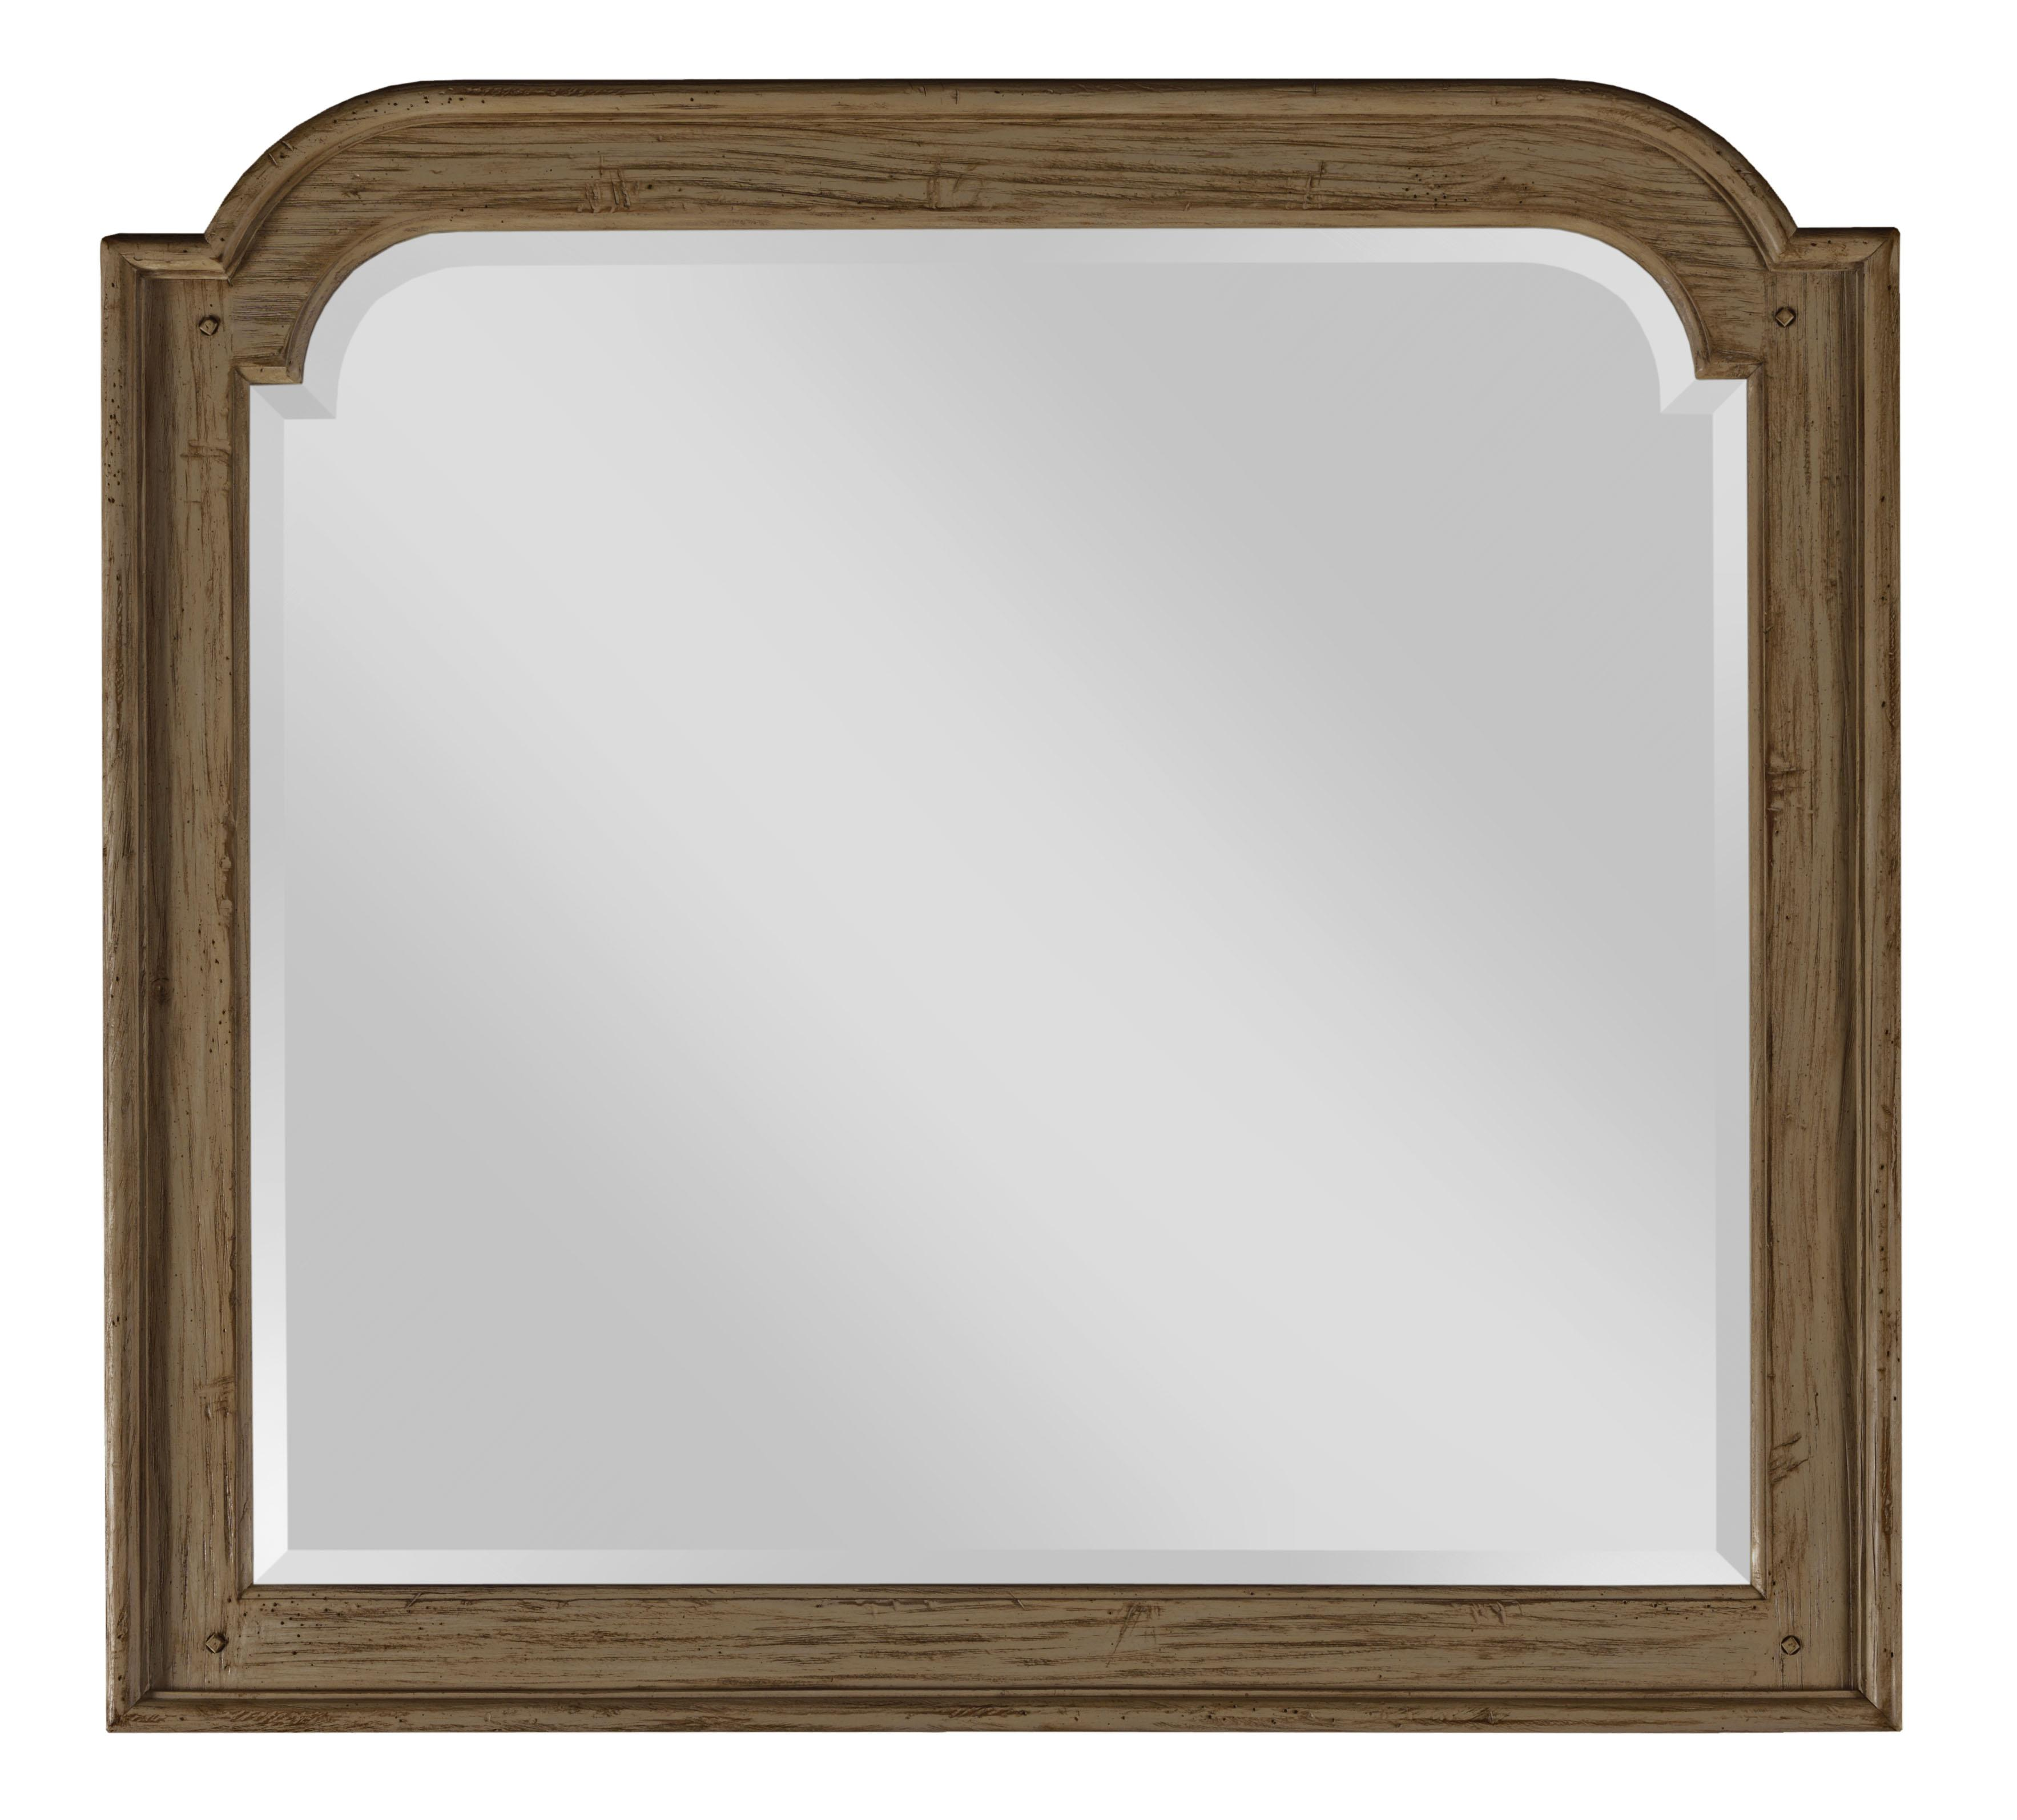 Weatherford Westland Mirror at Stoney Creek Furniture